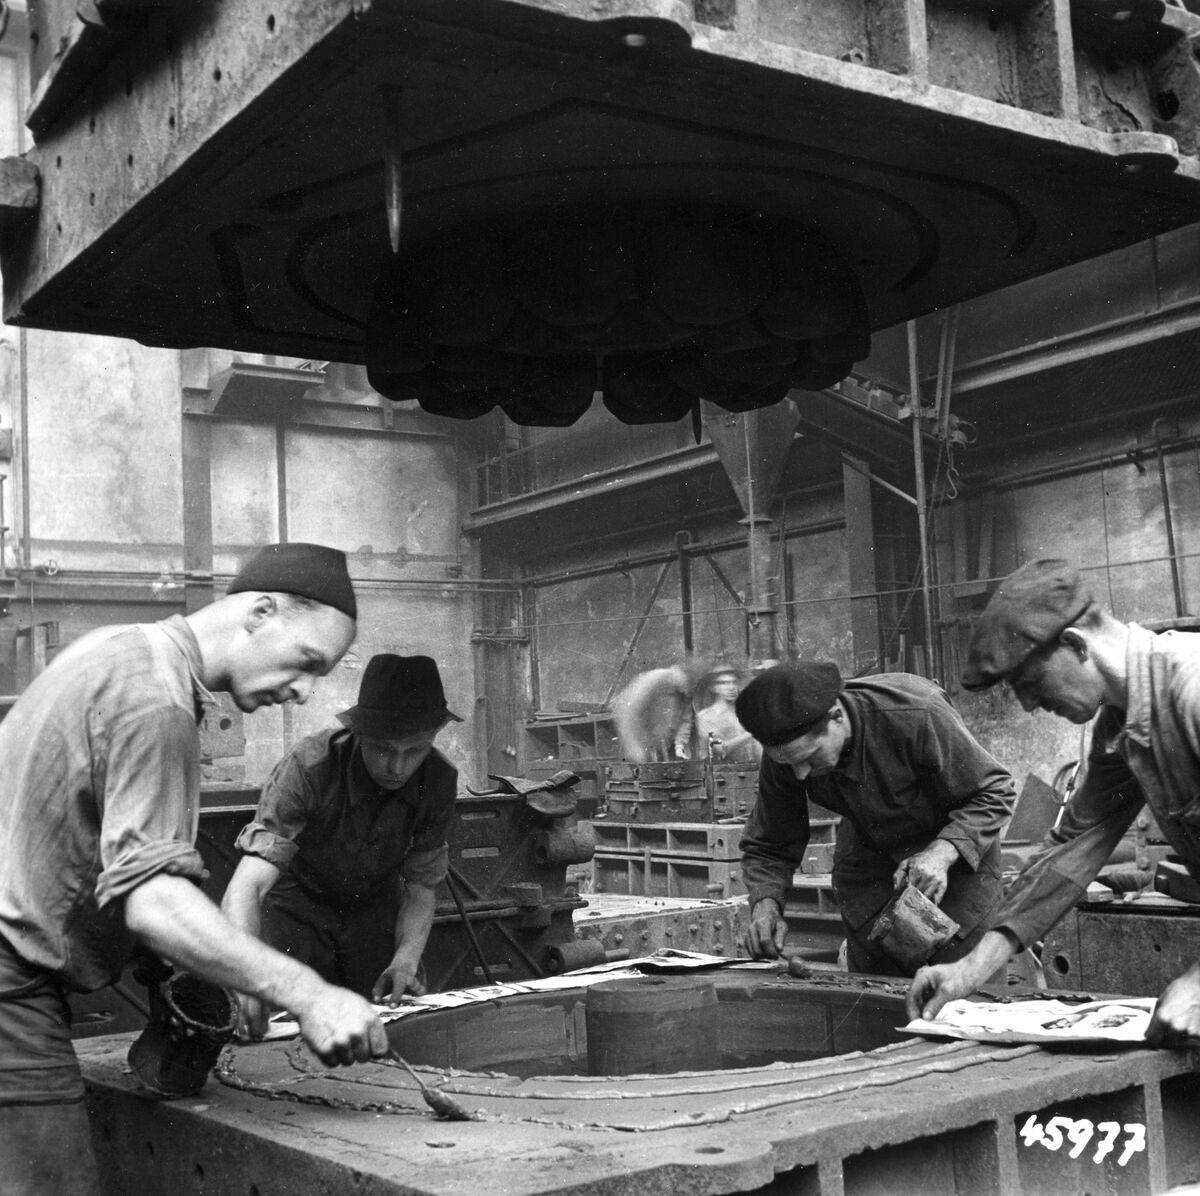 GFA 12/45977: Reportage casting process in malleable casting